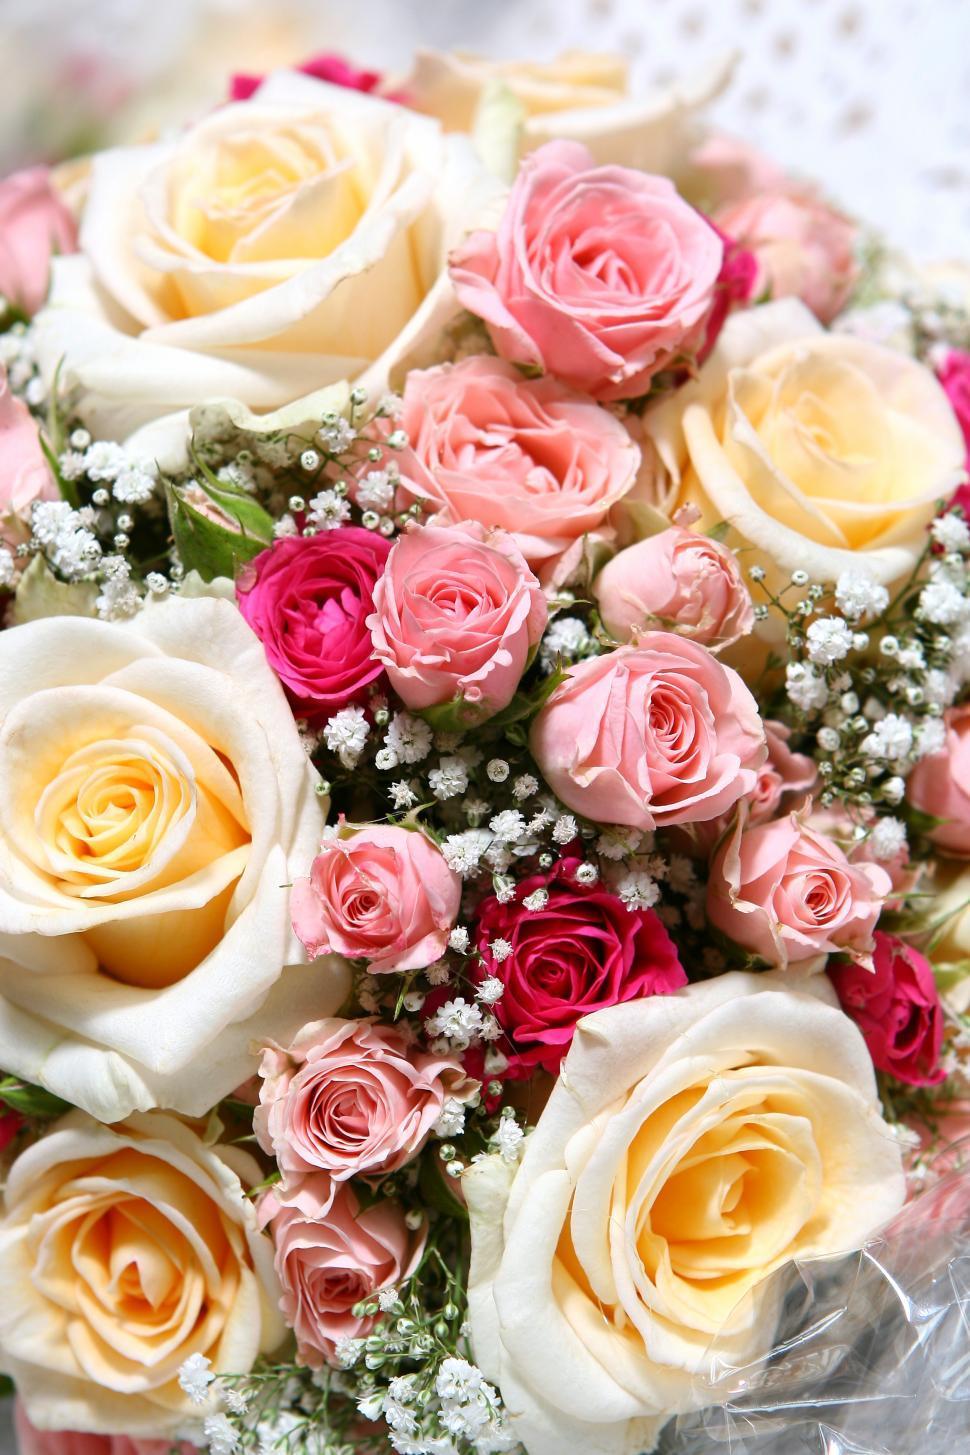 Download Free Stock Photo of Beautiful fresh wedding flowers arranged